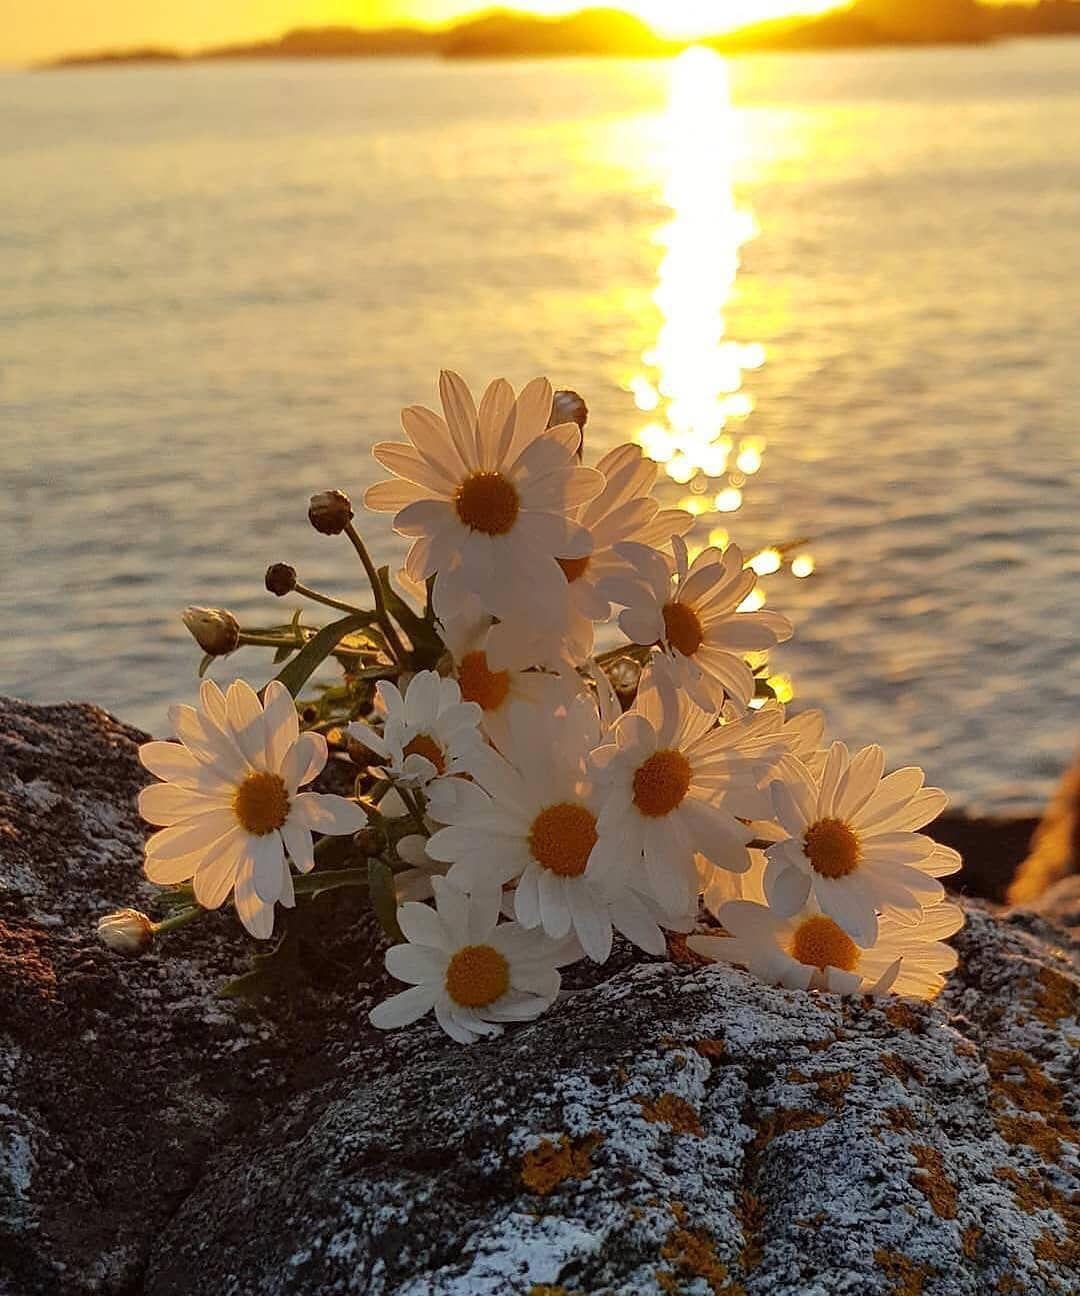 Sunrise Flowers Nature Amazing Beautiful Beautifulnature Amazingnature Lovely Poster Bunga Bunga Daisy Bunga Liar